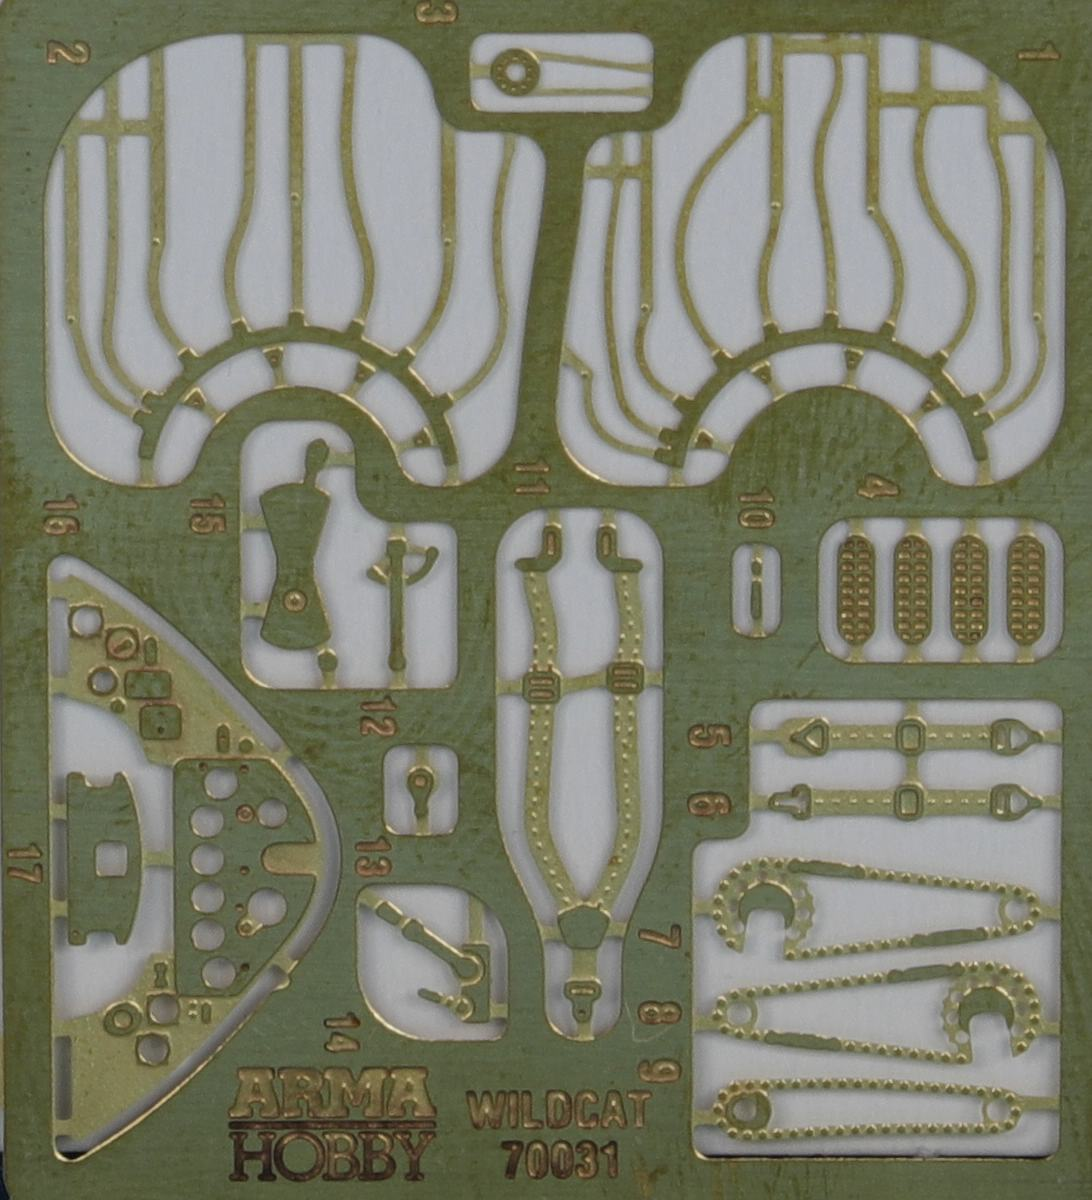 Arma-Hobby-70031-FM-2-Wildcat-26 FM-2 Wildcat in 1:72 von Arma Hobby # 70031